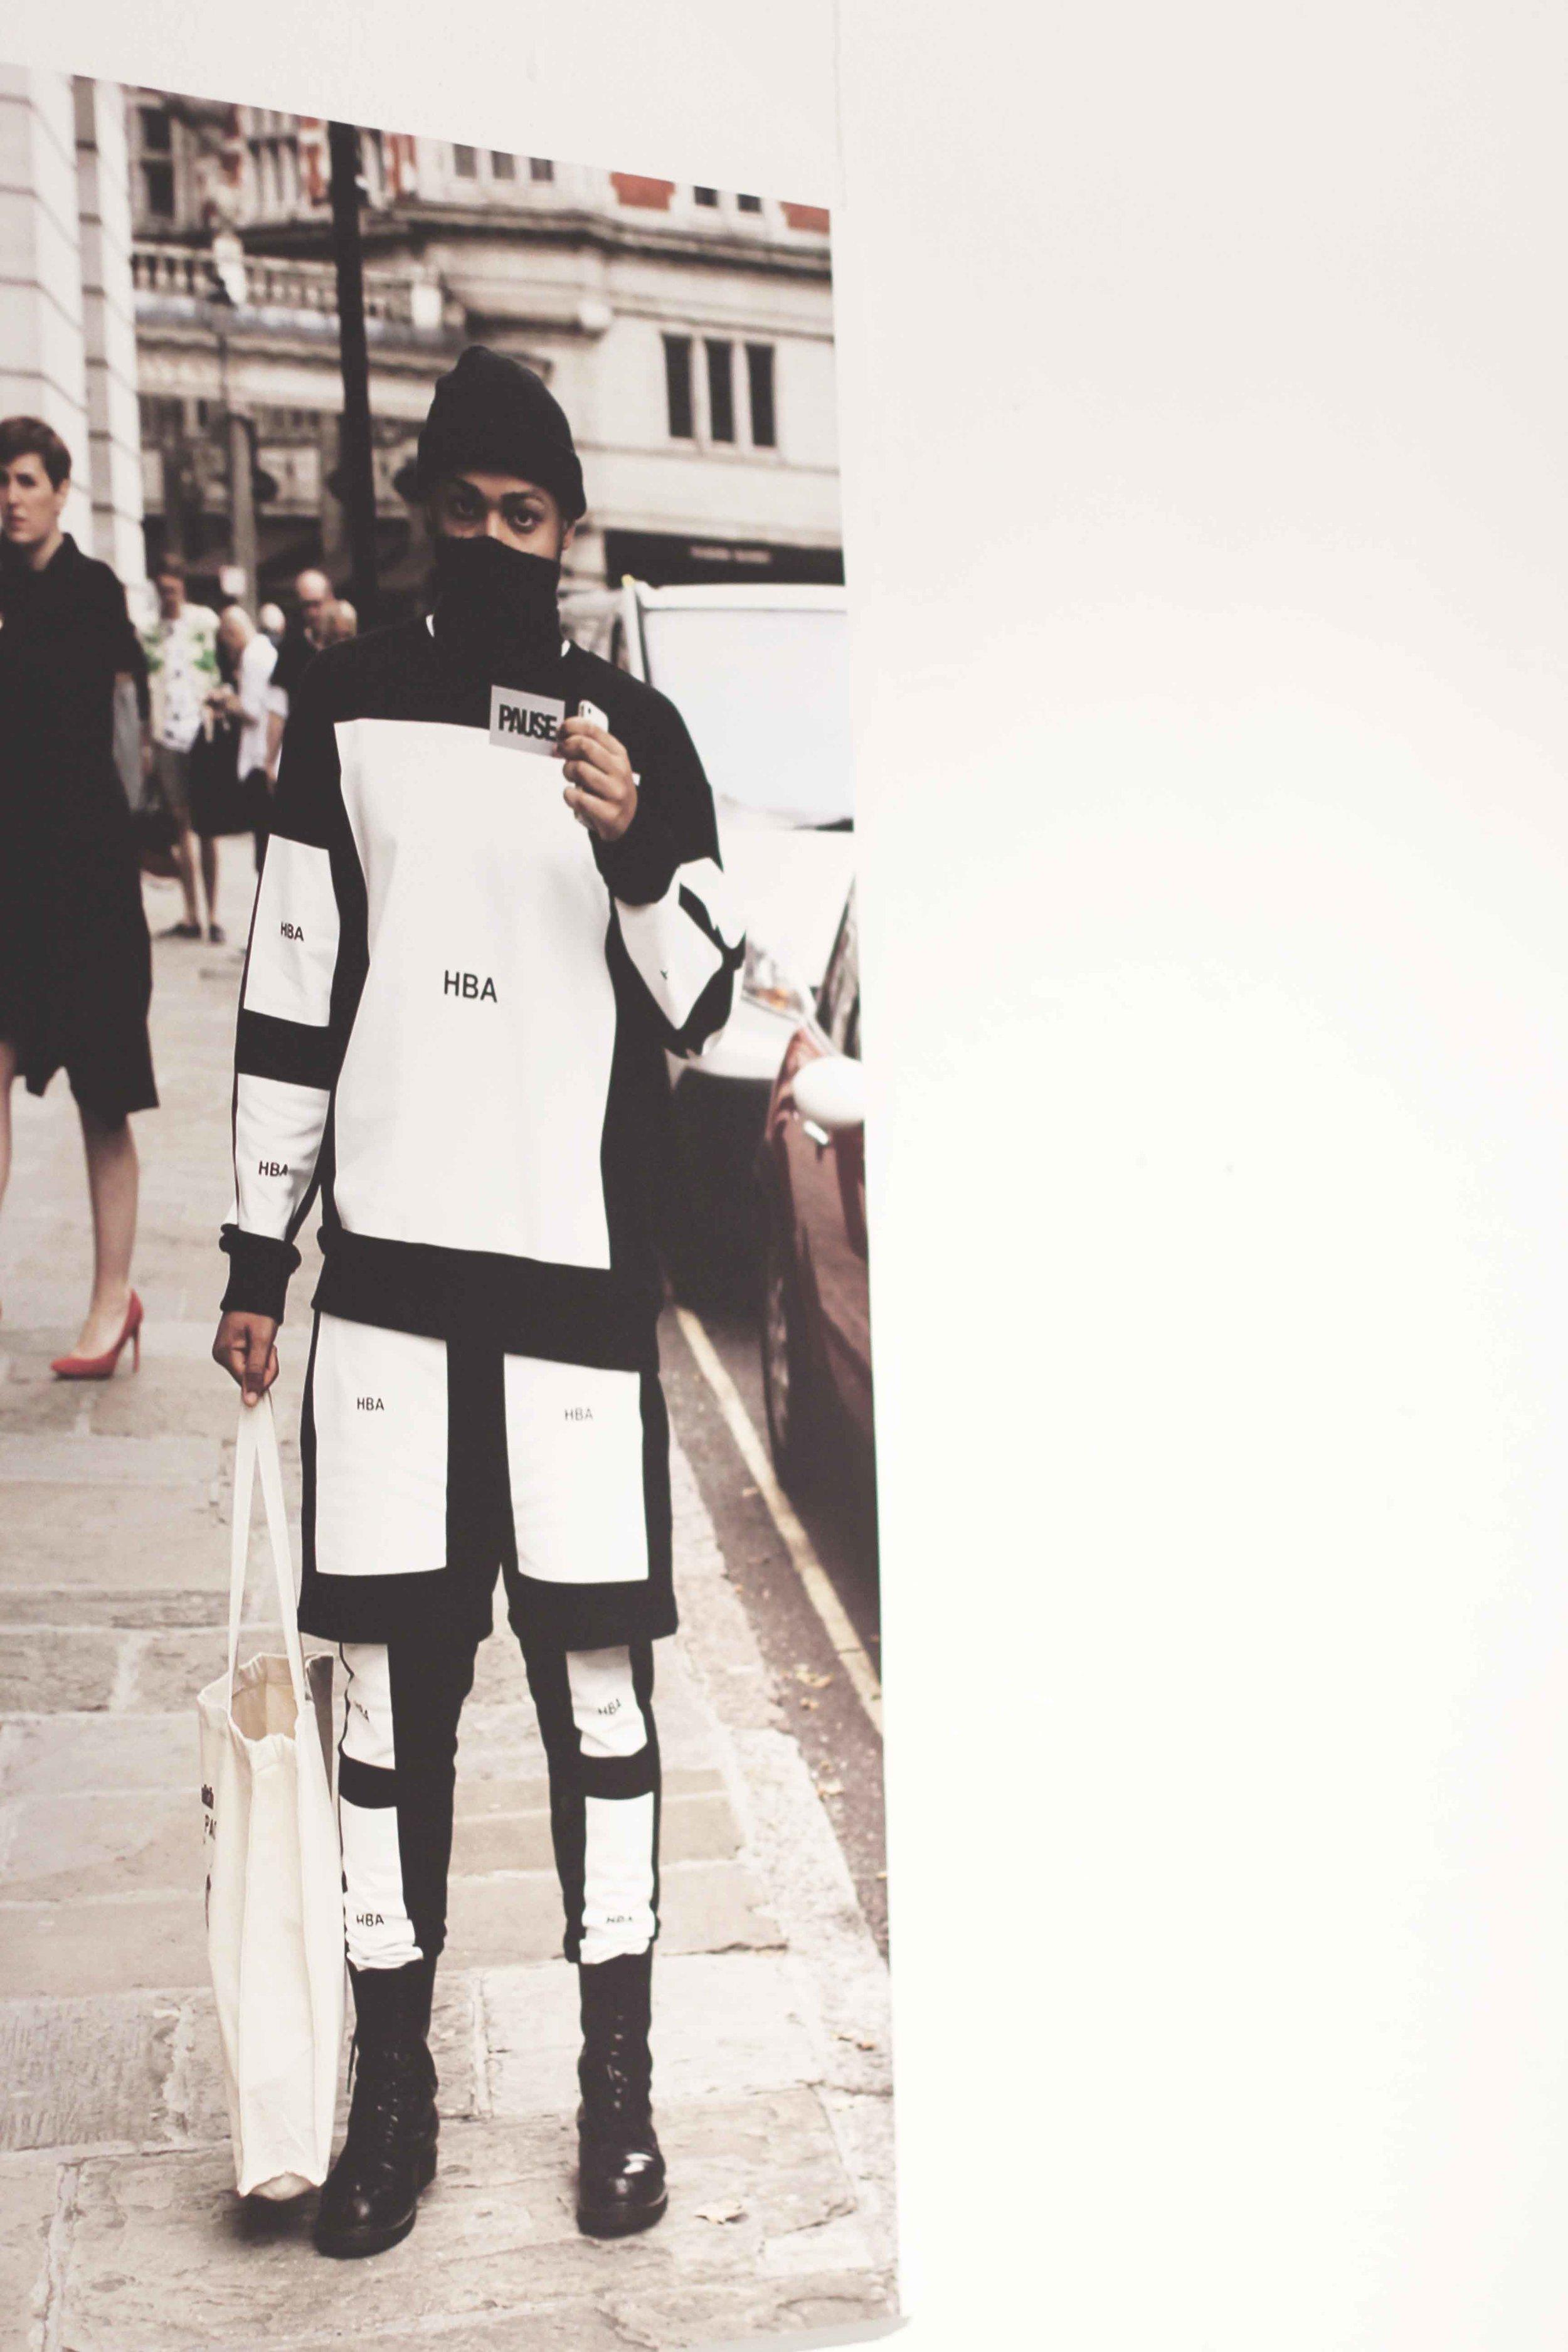 Jordan_Bunker_PAUSE_street_style_exhibition_1.jpg